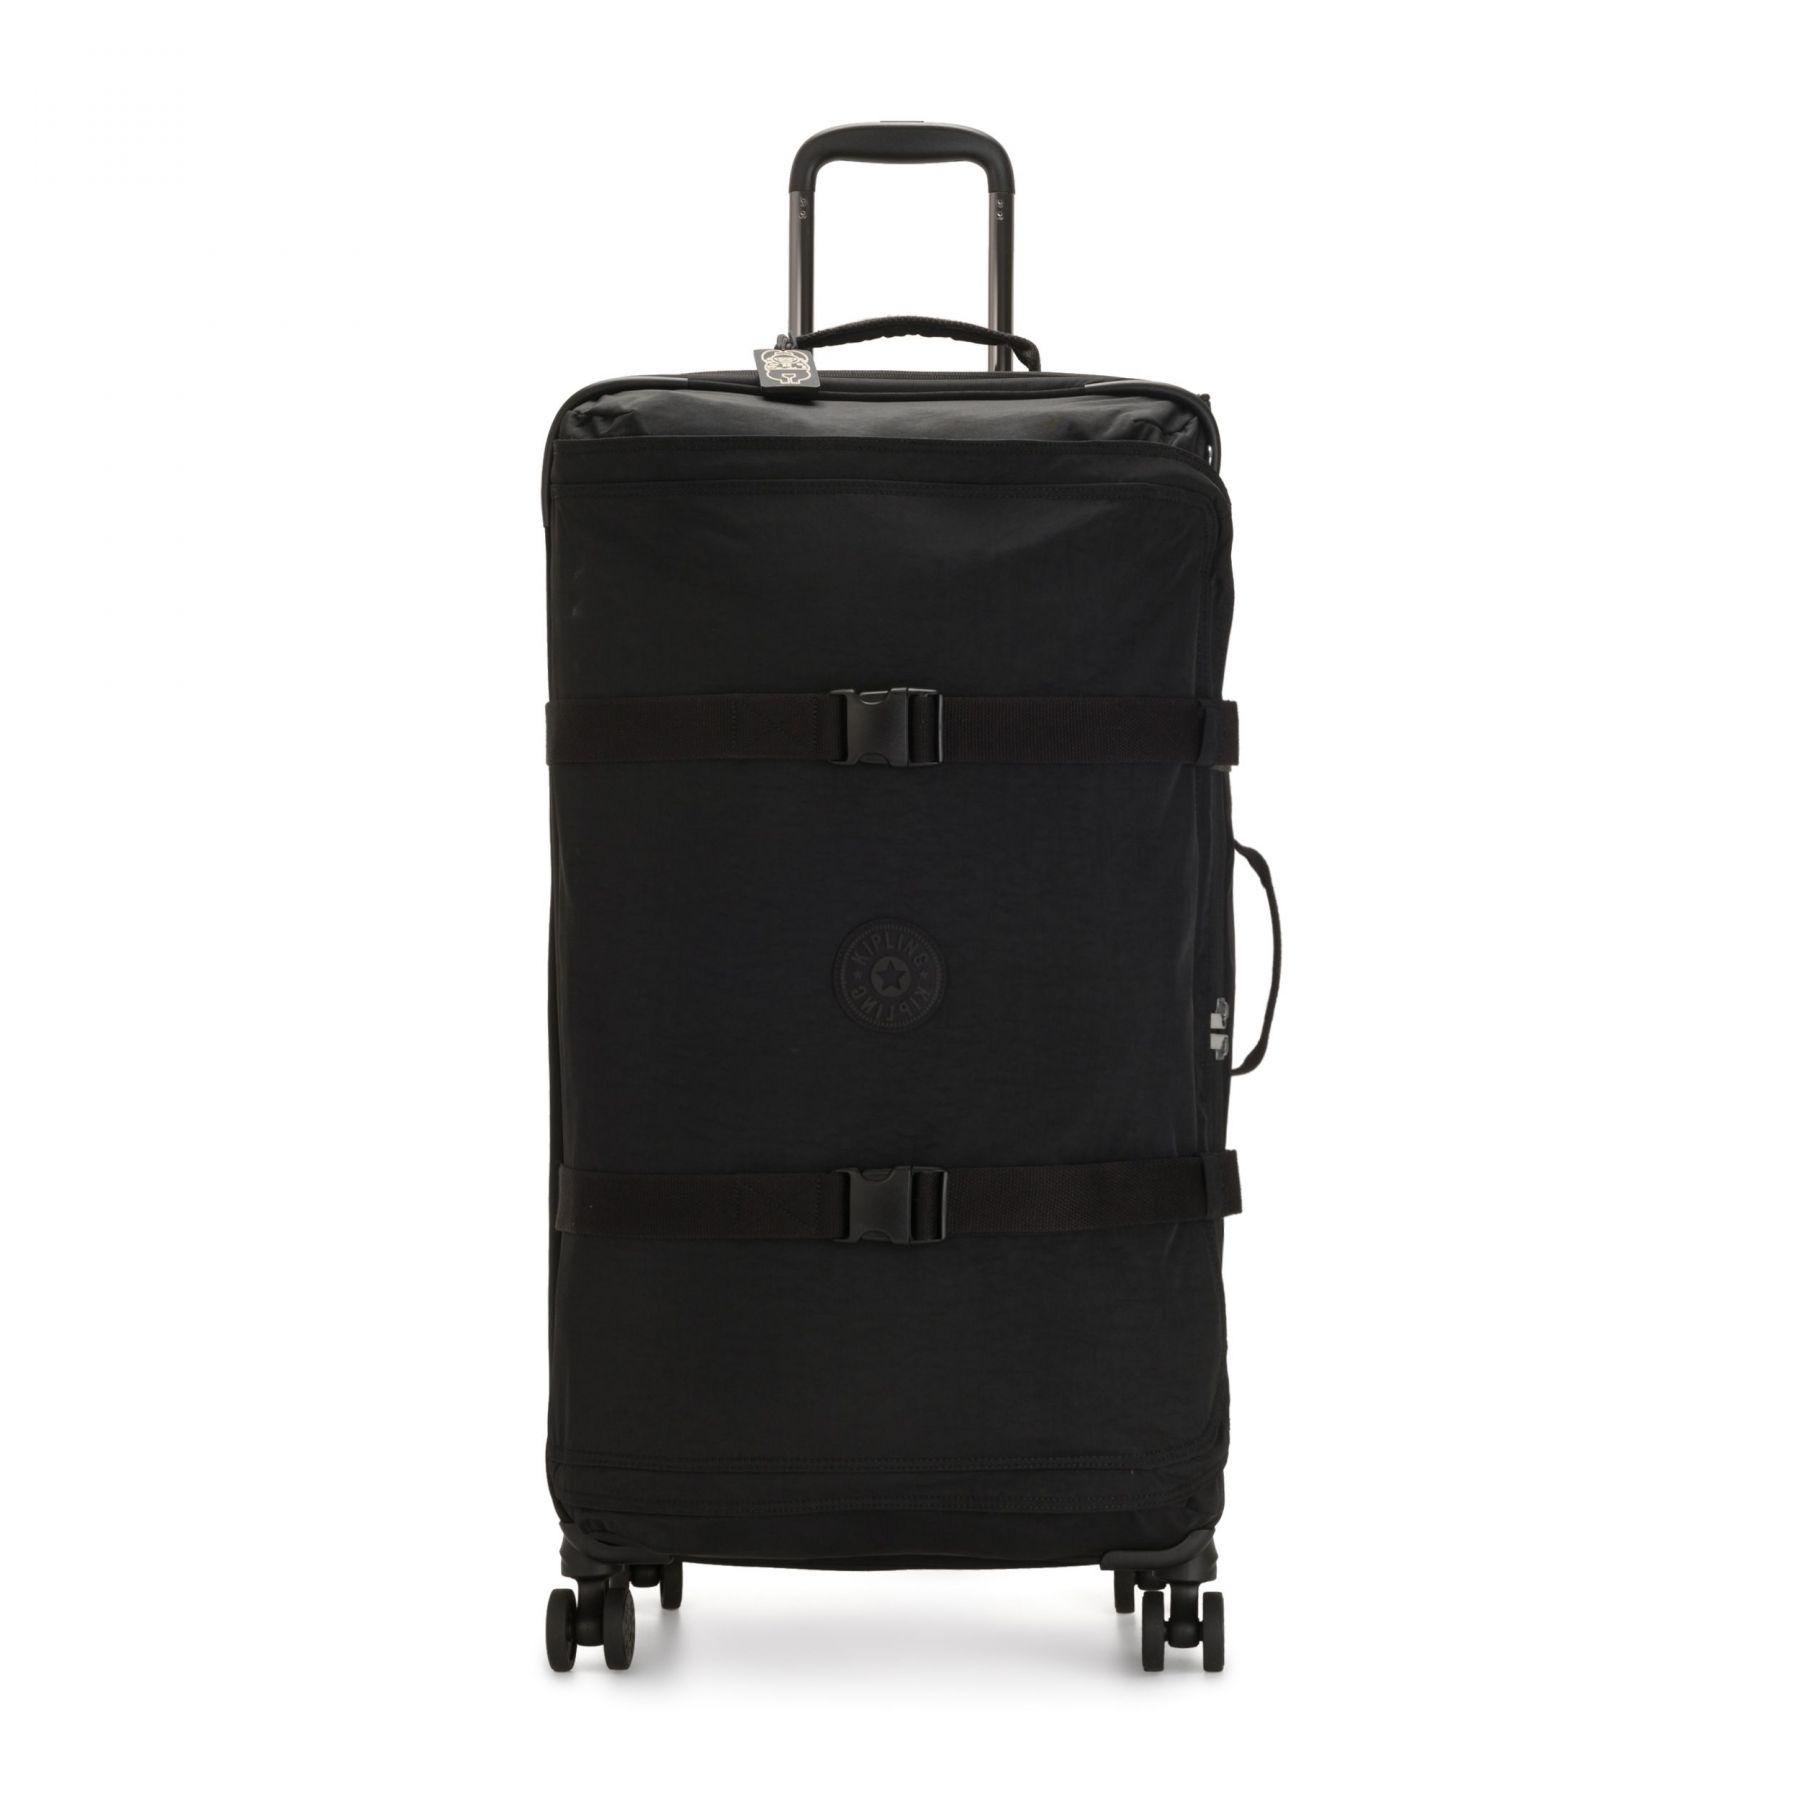 SPONTANEOUS L Latest Luggage by Kipling